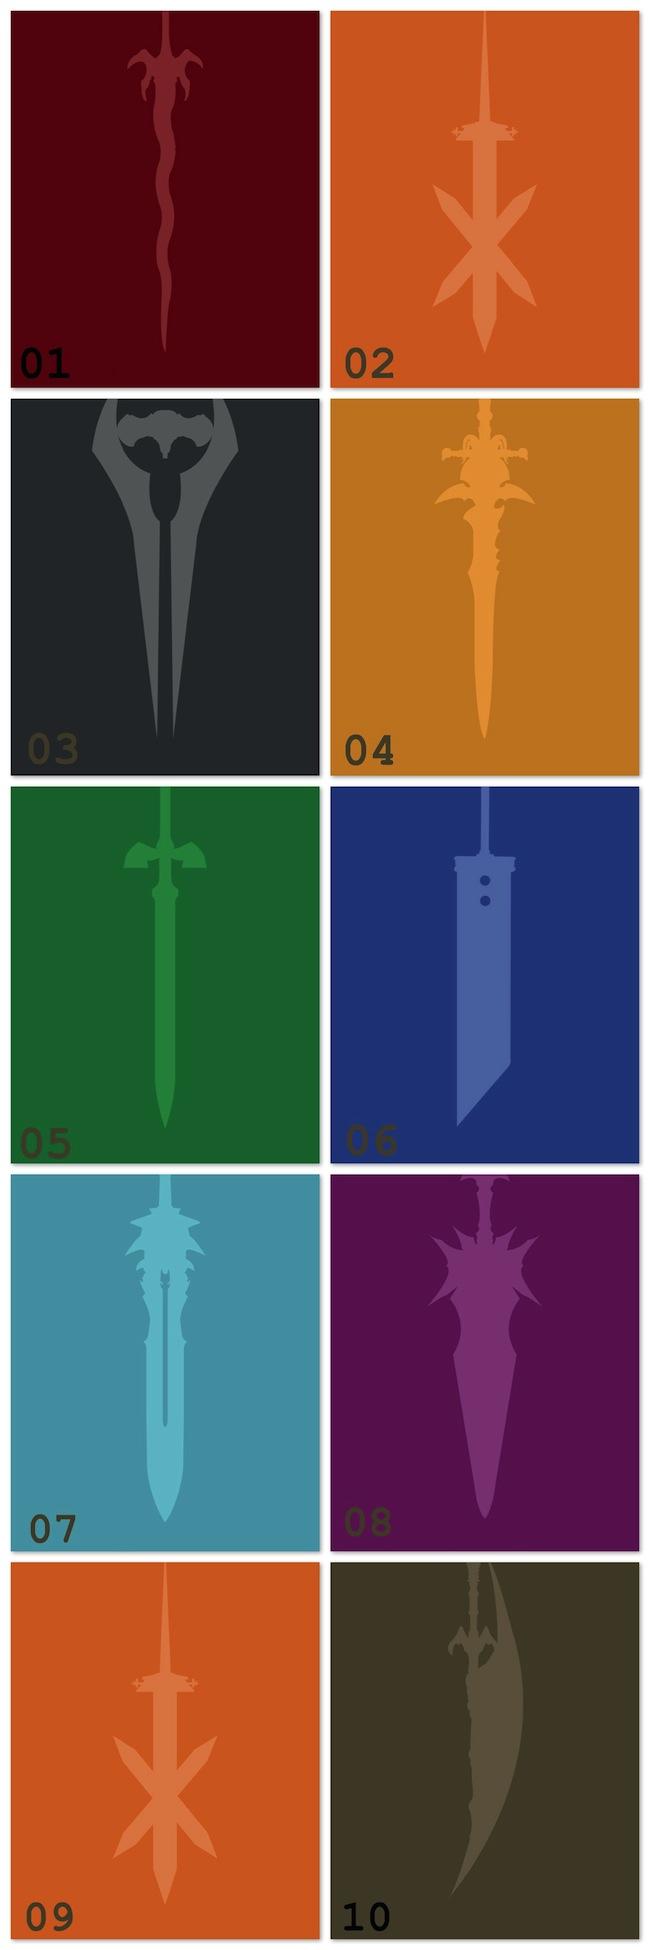 espadas video game nerd pai